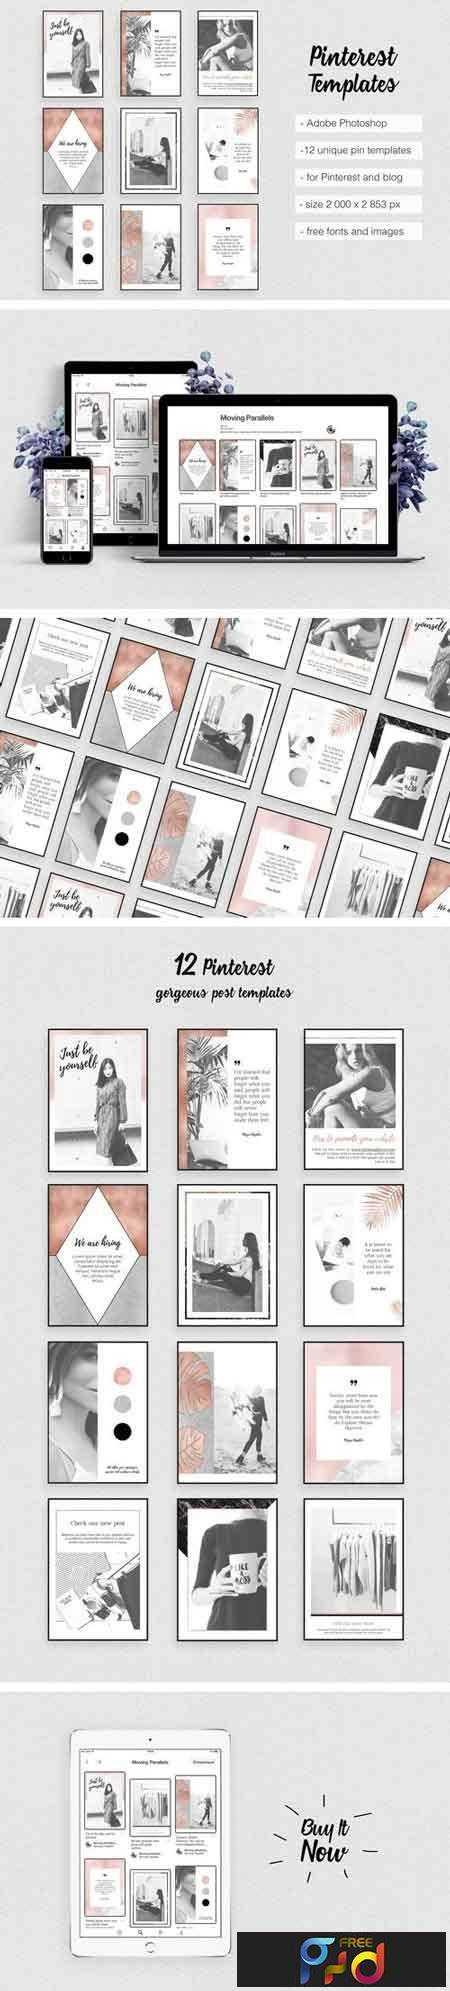 1802206 Pinterest Templates Rose Gold 2000348 1